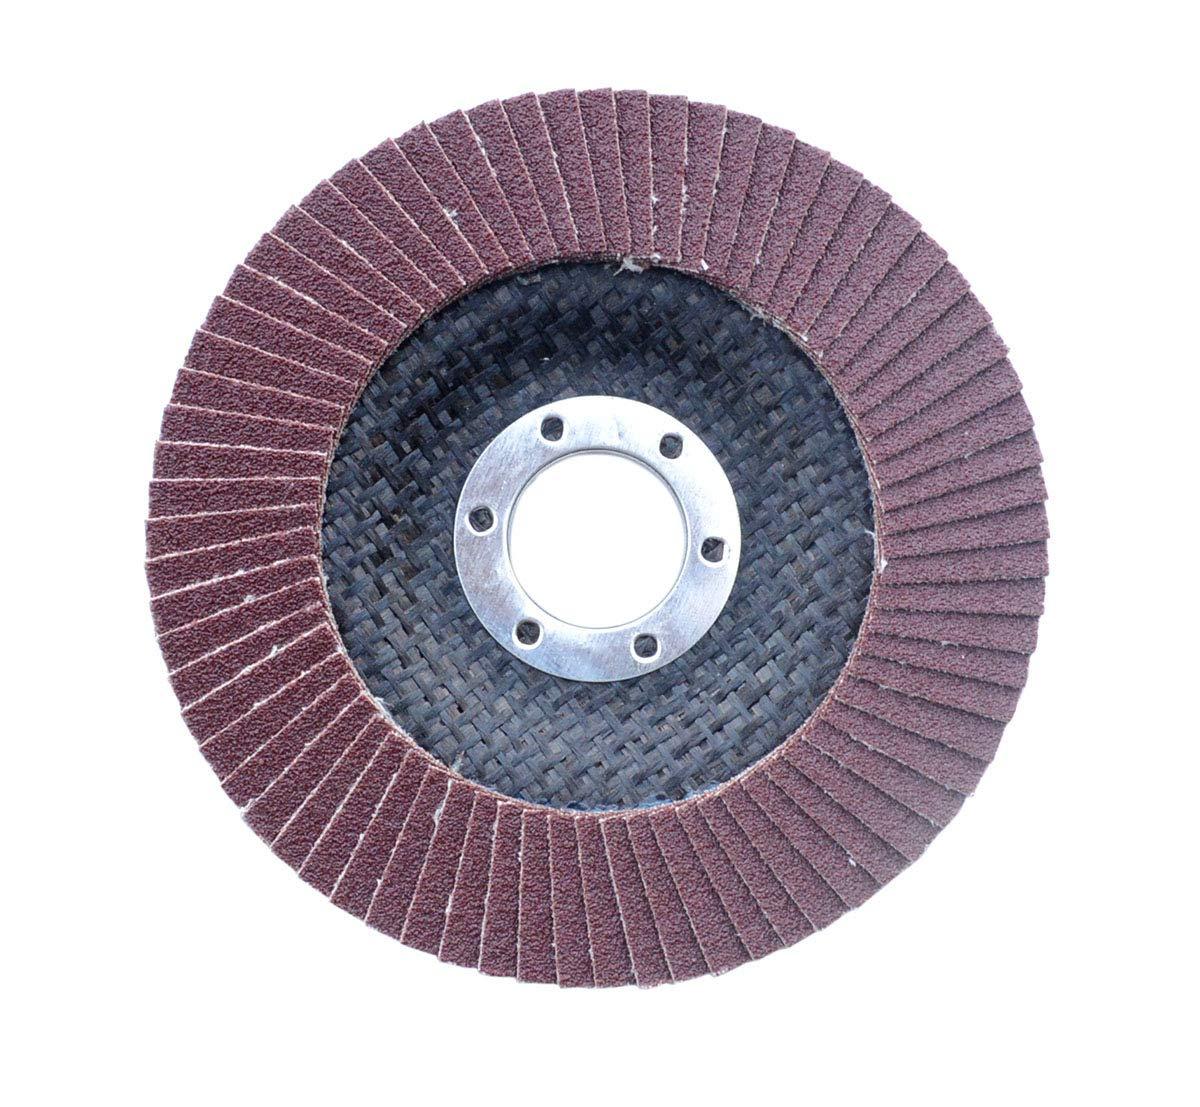 4.5inch 20pack Yansanido 20 Pack 4.5 Inch Flap Discs Grinding Wheel 40 60 80 120 Grit Sanding Discs